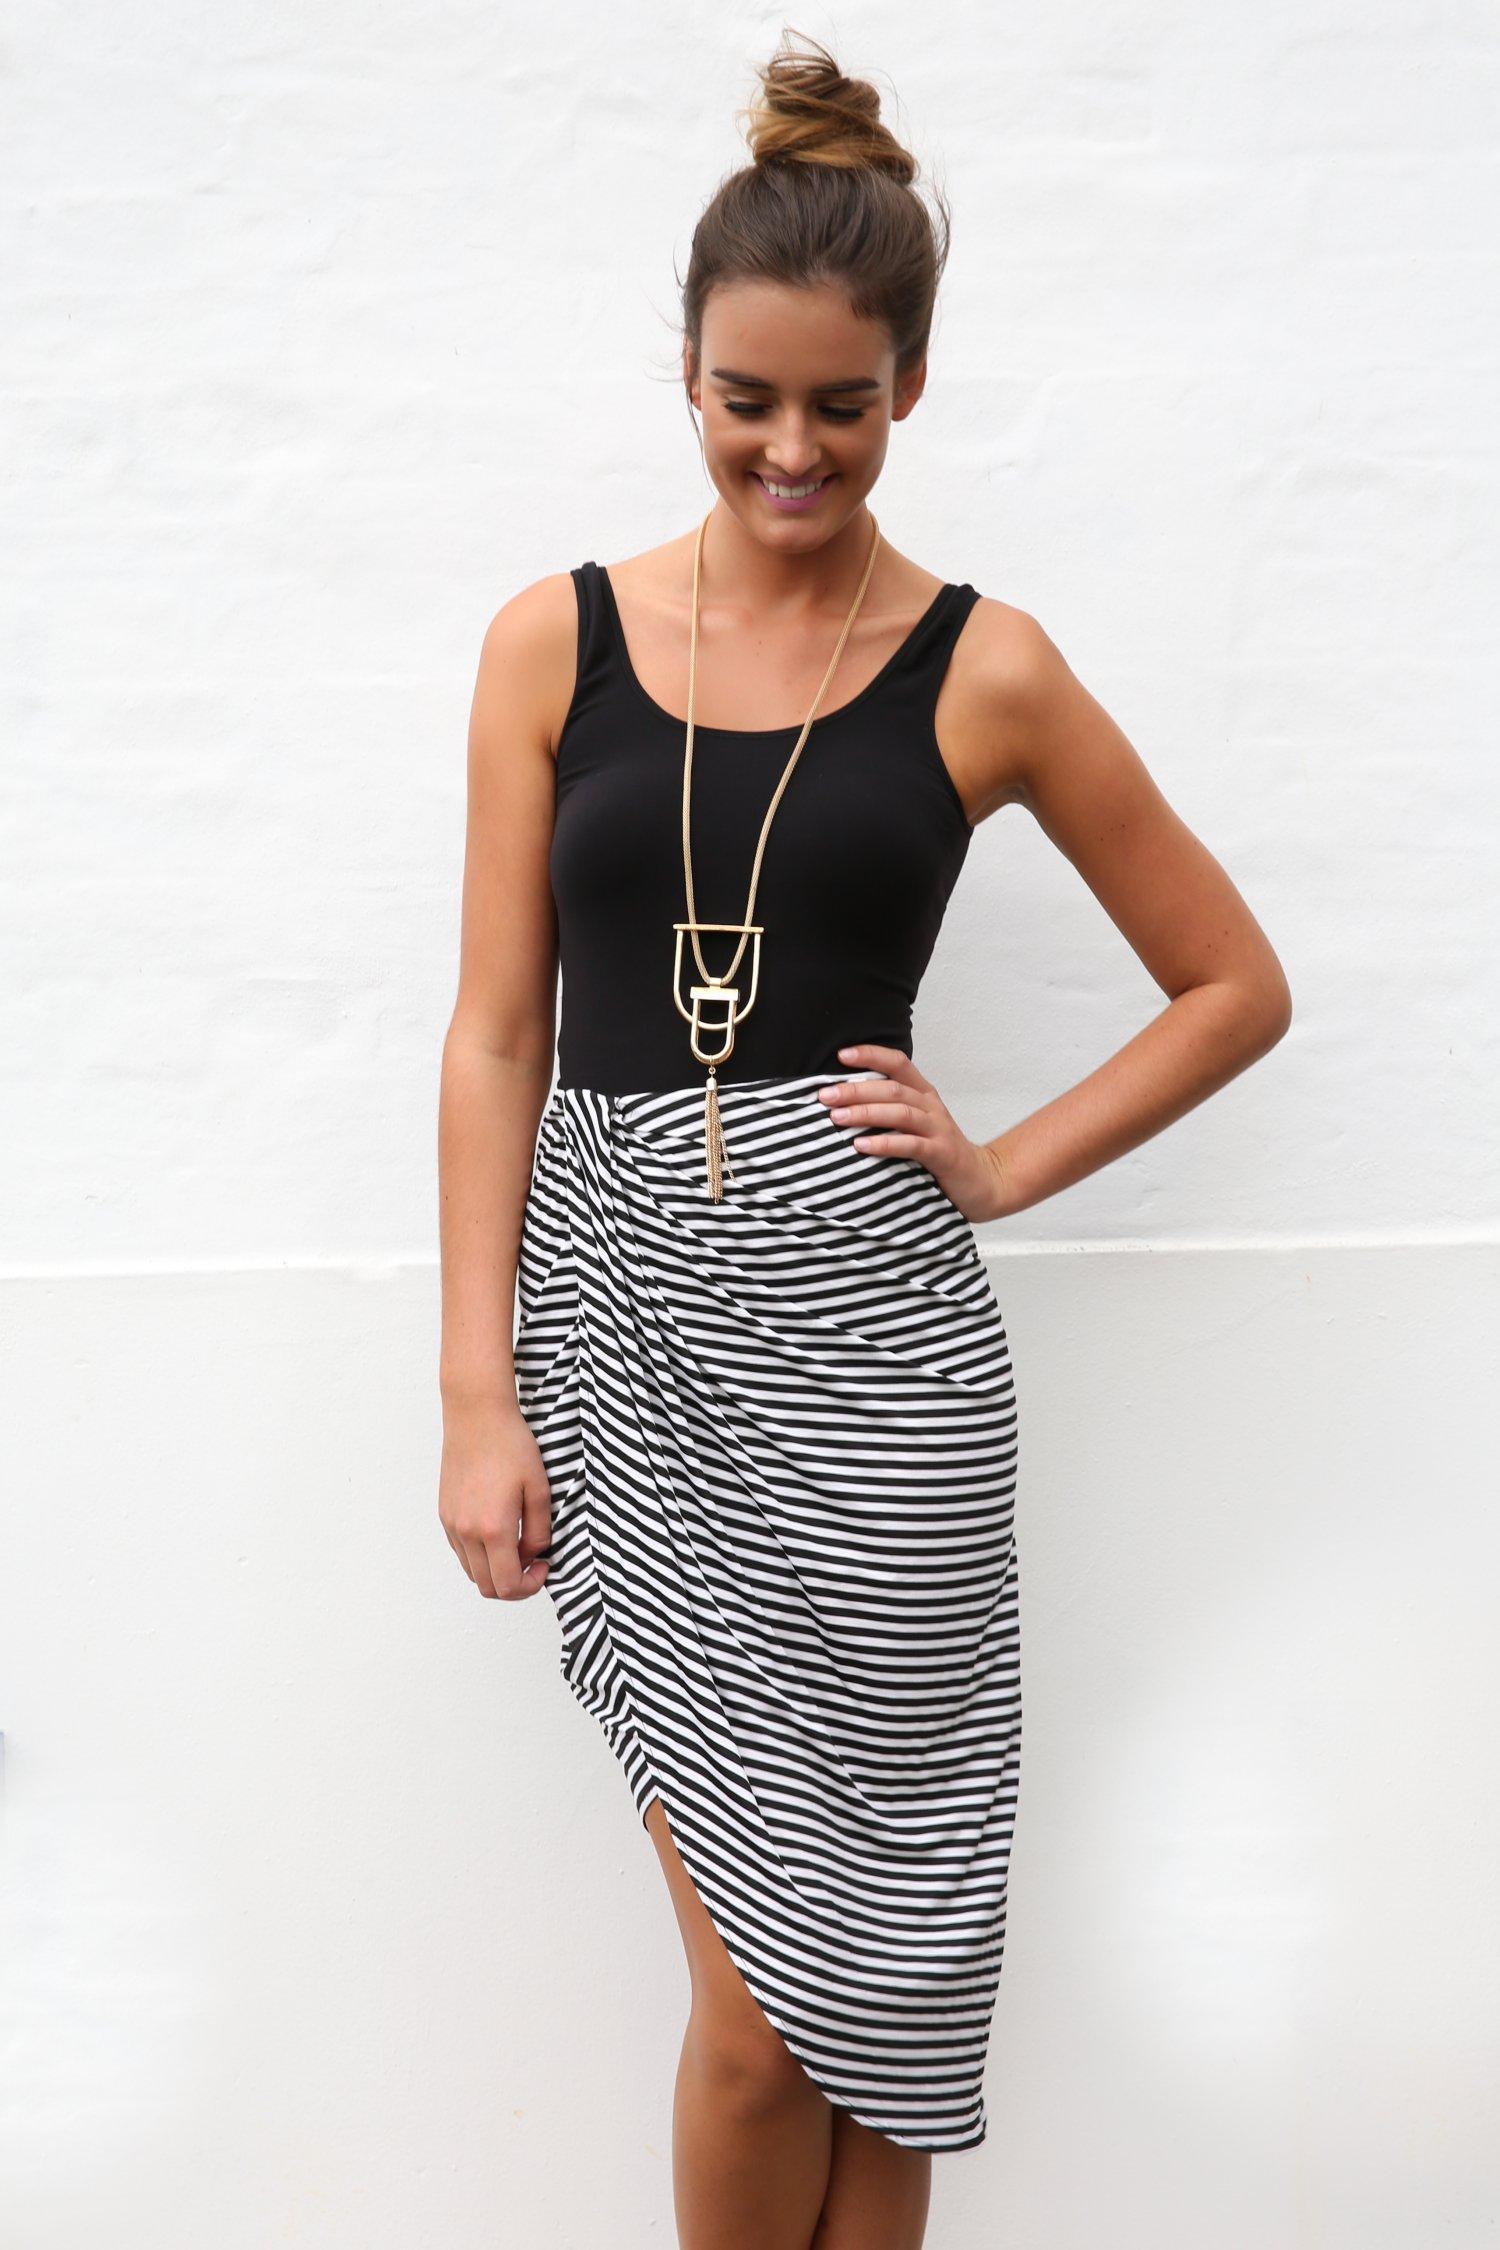 Black Prints Skirt - Black and White Striped Asymmetrical | UsTrendy